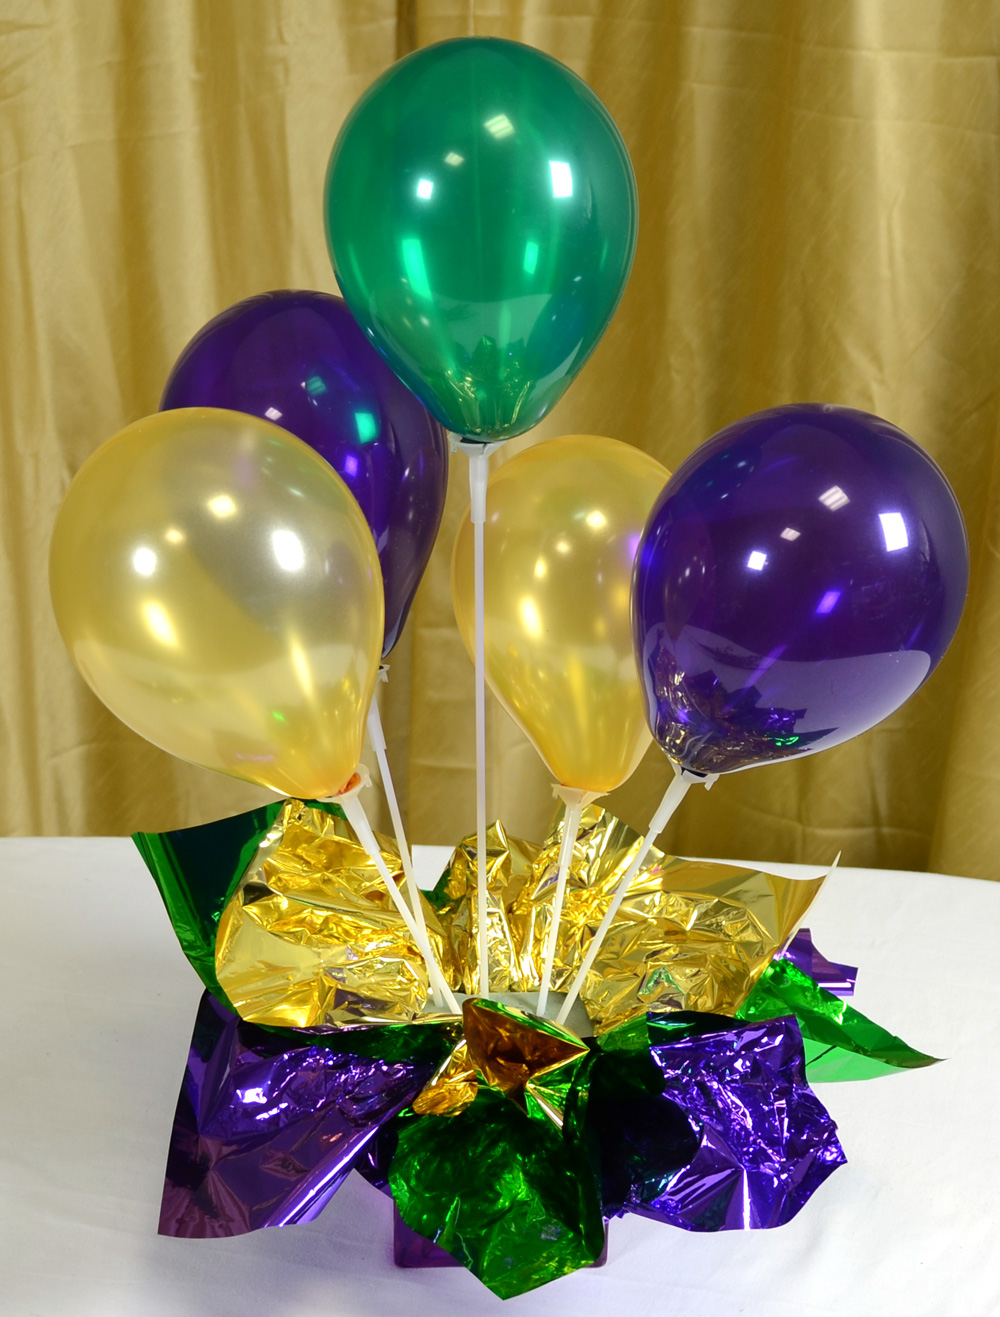 Balance Colors Of Balloons